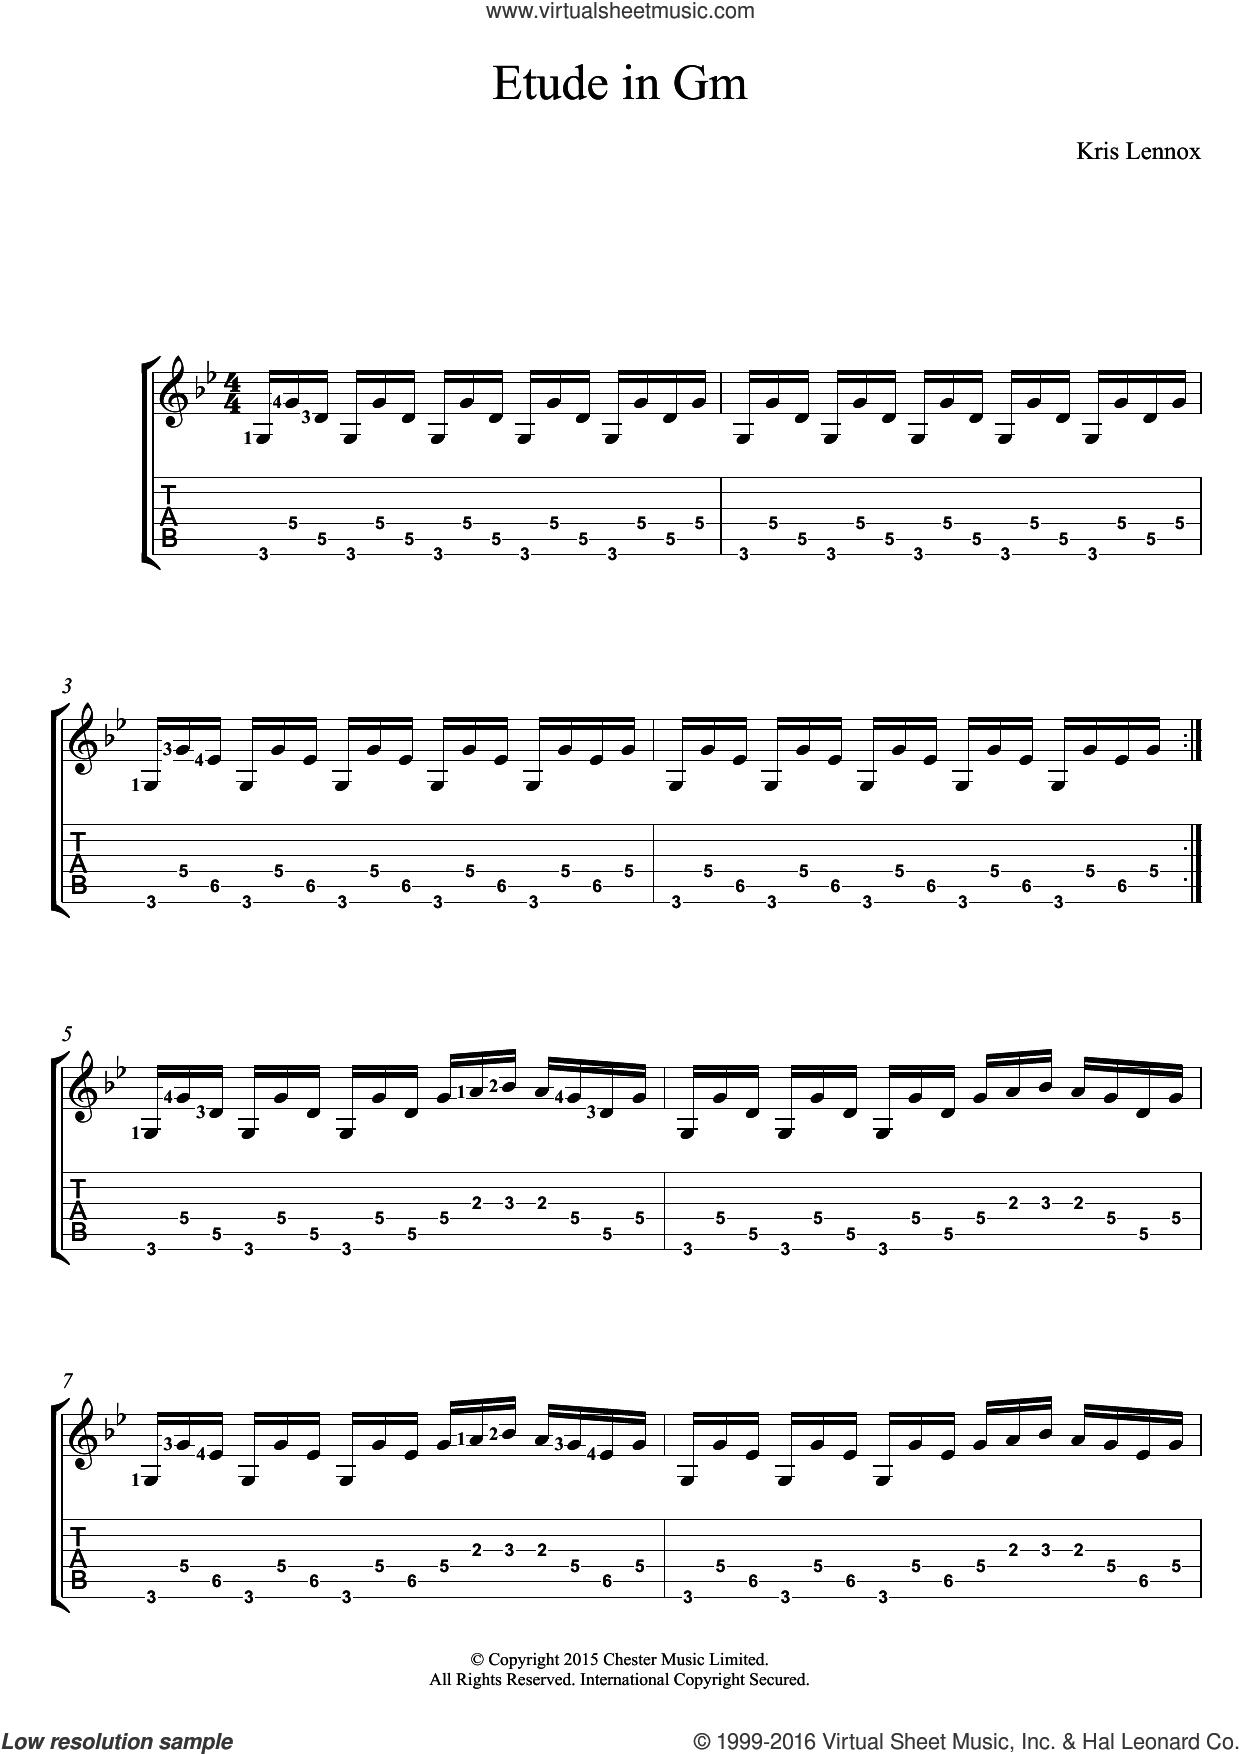 Etude In Gm sheet music for guitar (tablature) by Kris Lennox, intermediate skill level